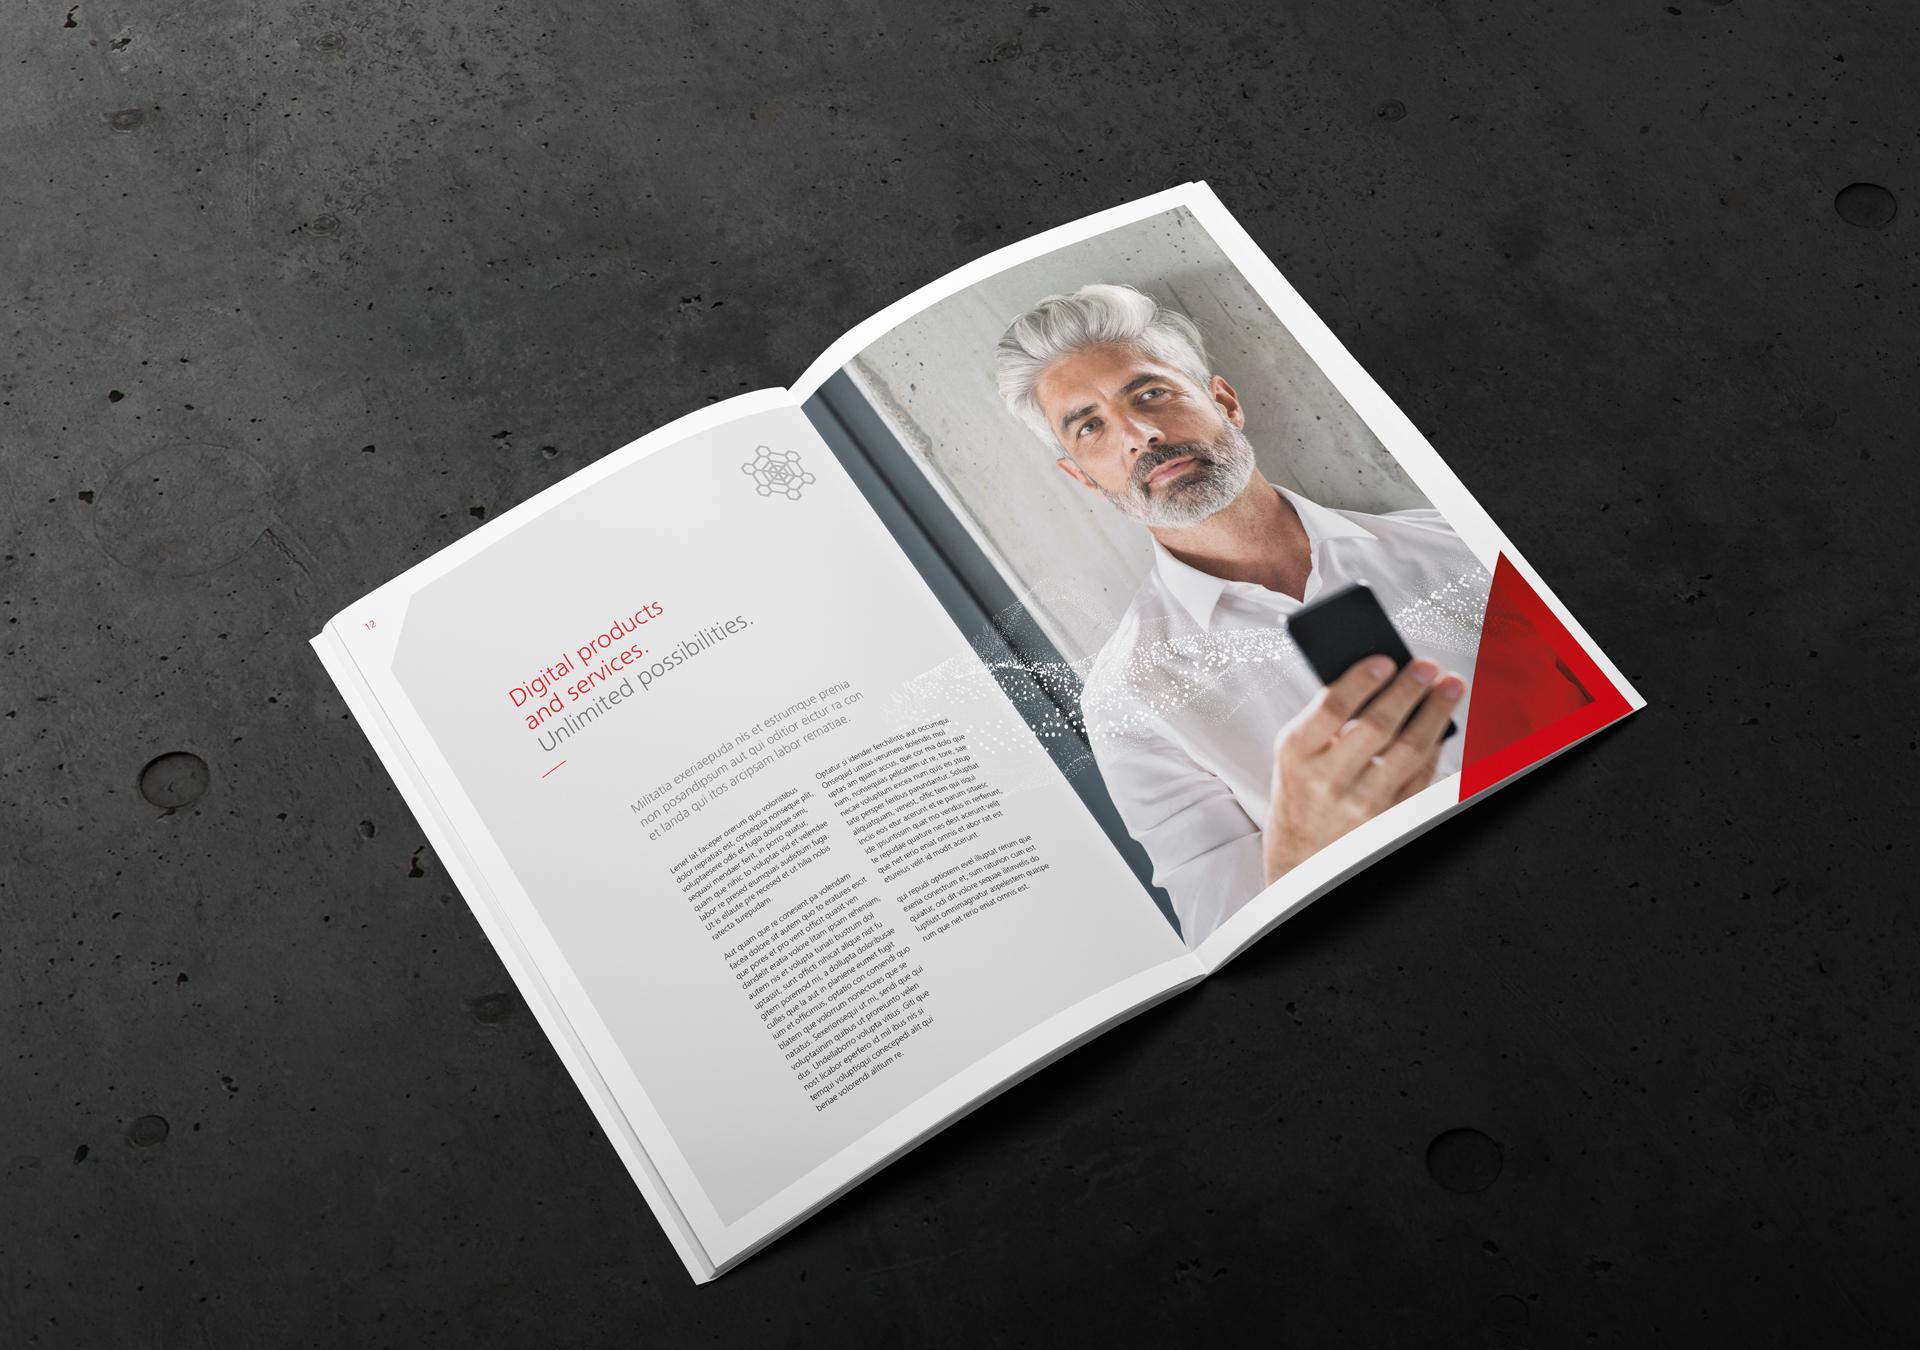 Kreuzer-Design_SDB_Ahead_Mockup-Broschuere_A4_Inside_12-13.jpg